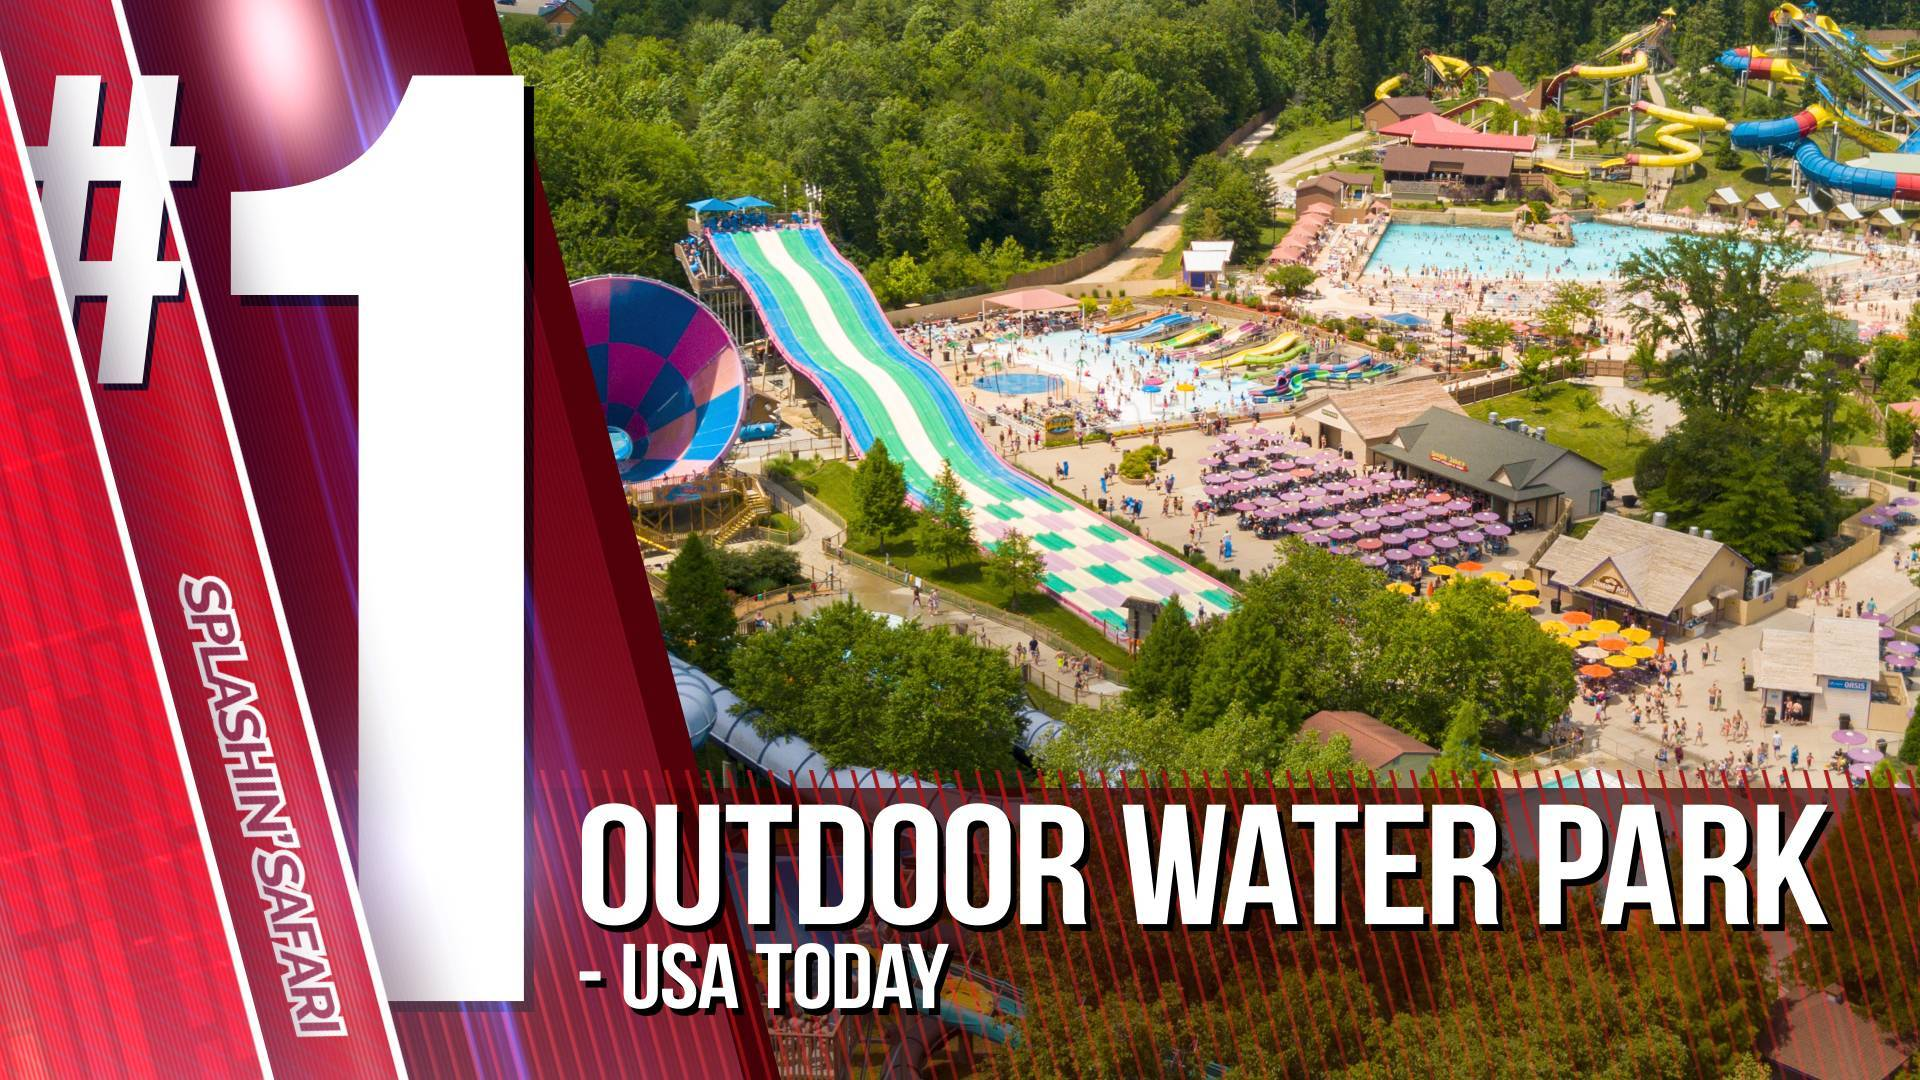 Splashin' Safari: #1 Outdoor Water Park - USA Today